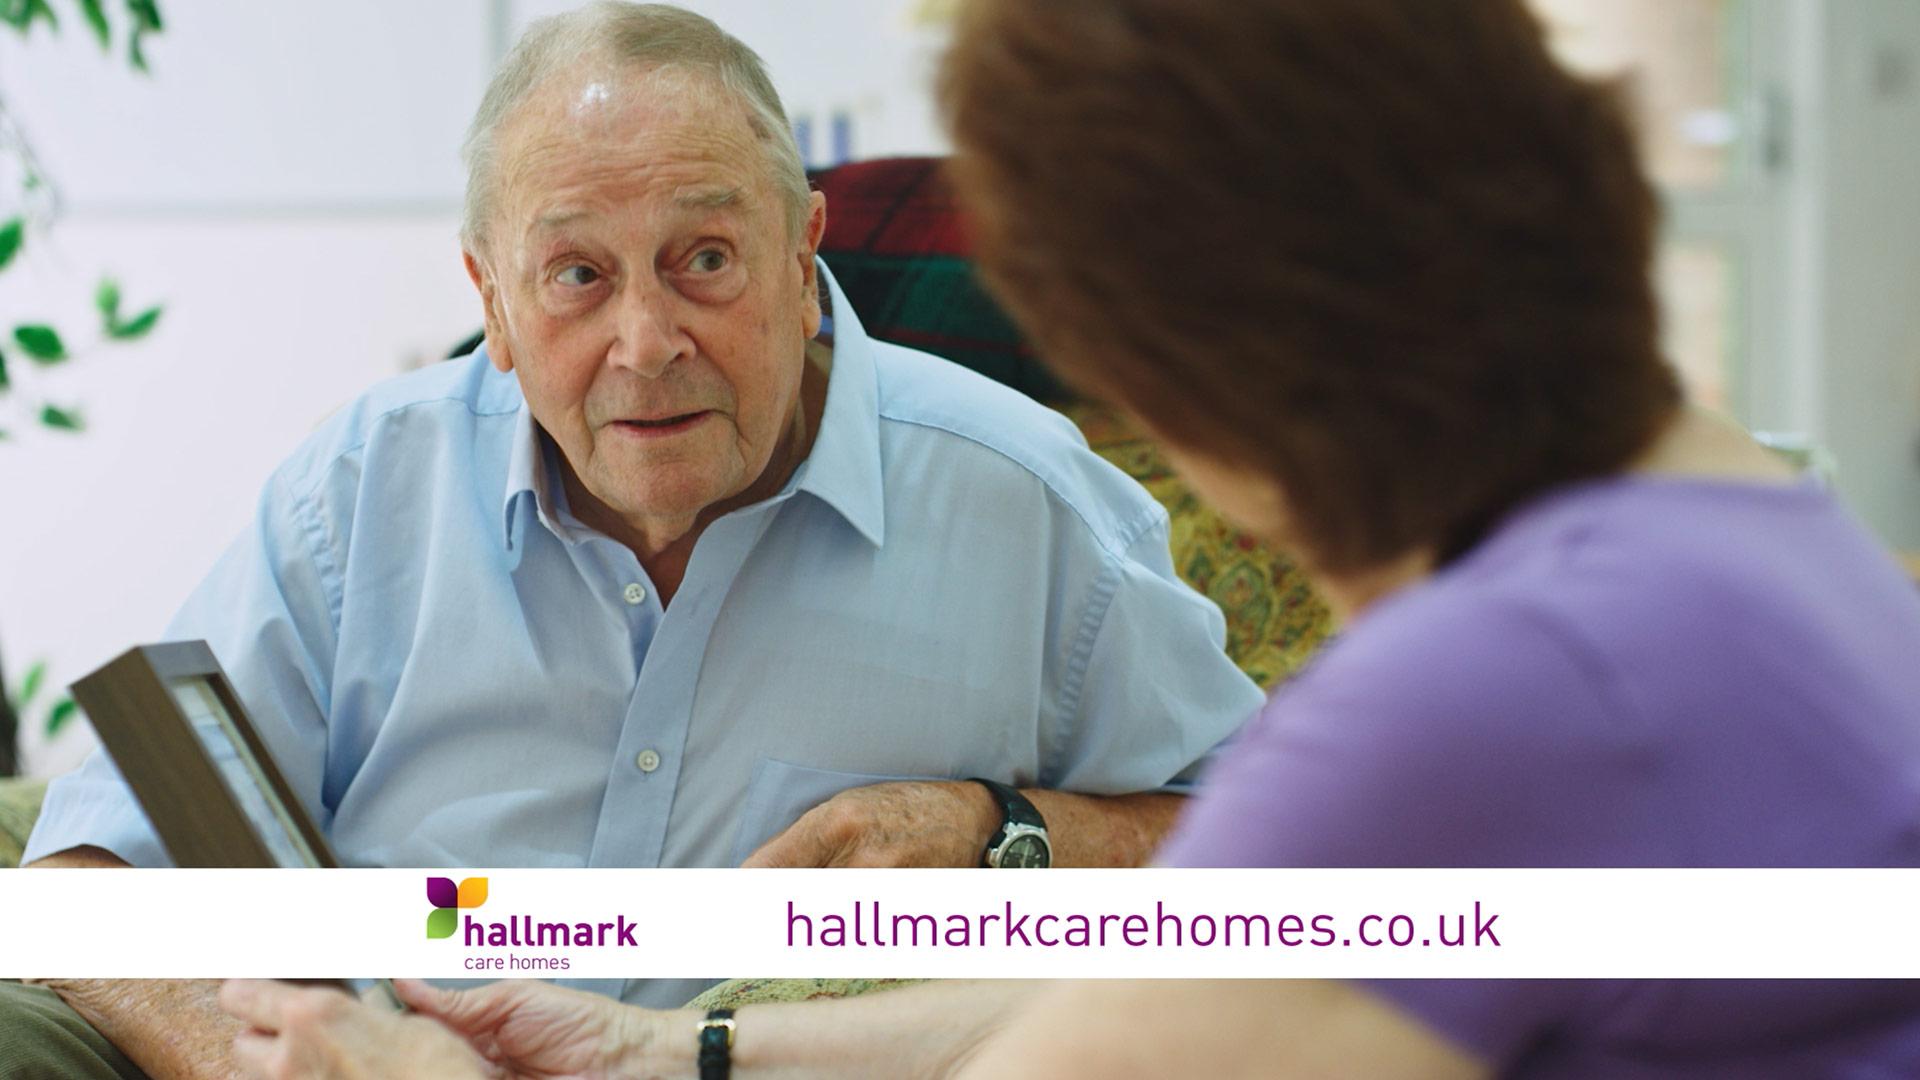 Hallmark Care Homes TV Ad